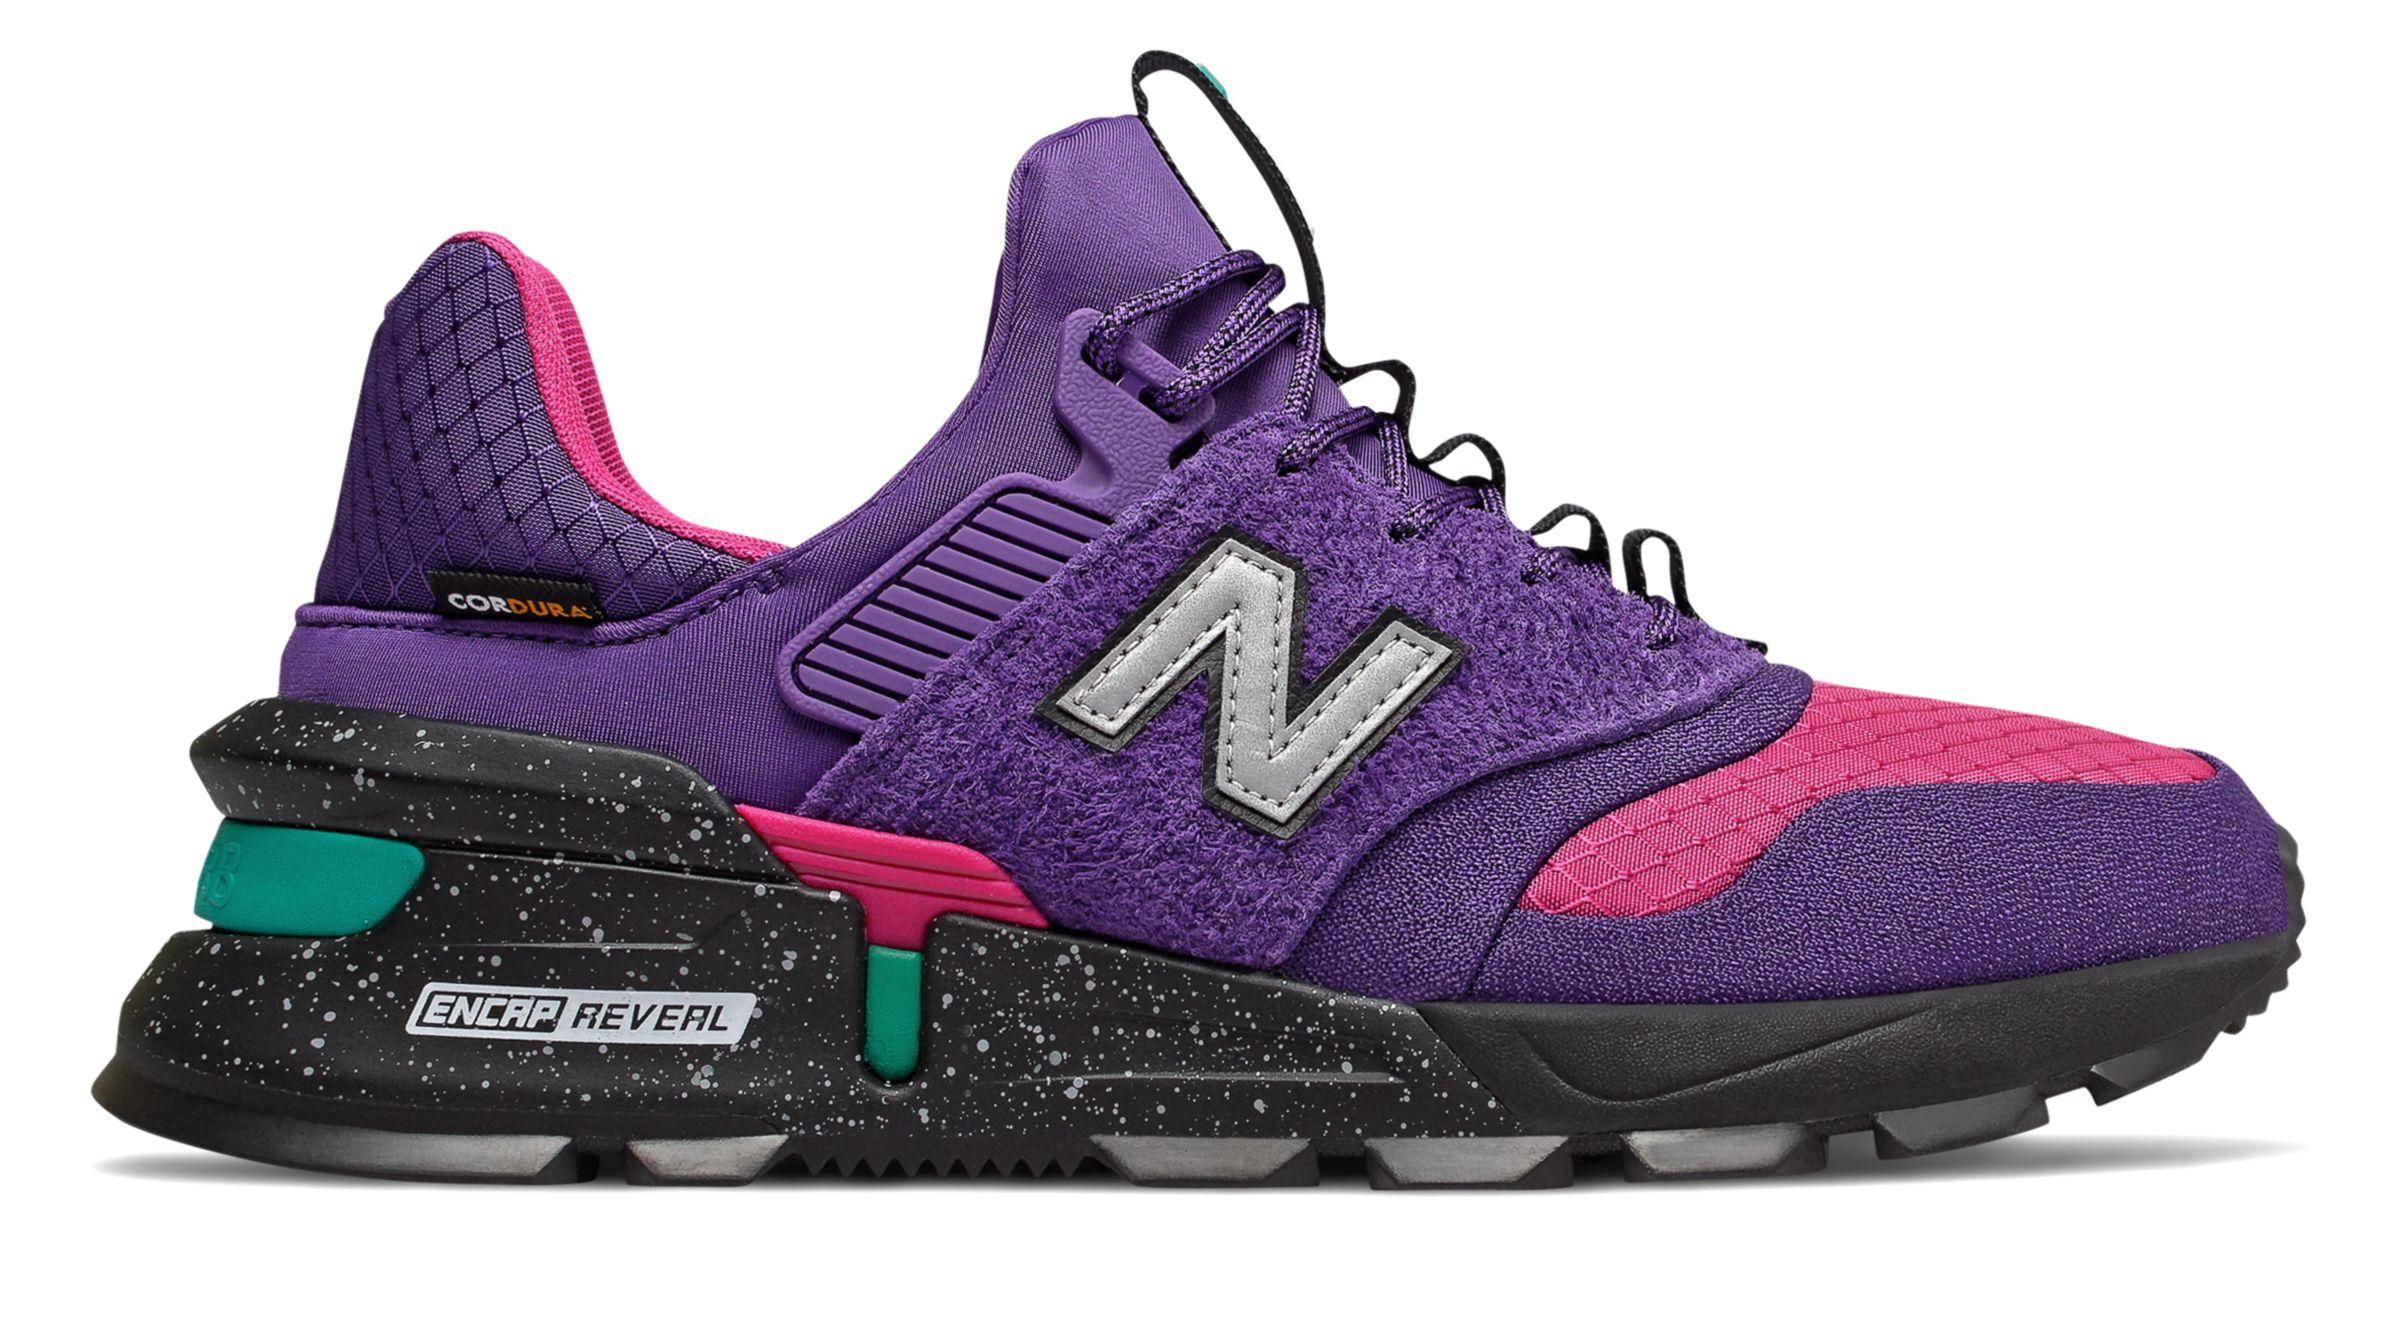 New Balance 997 Sport Trail Pack